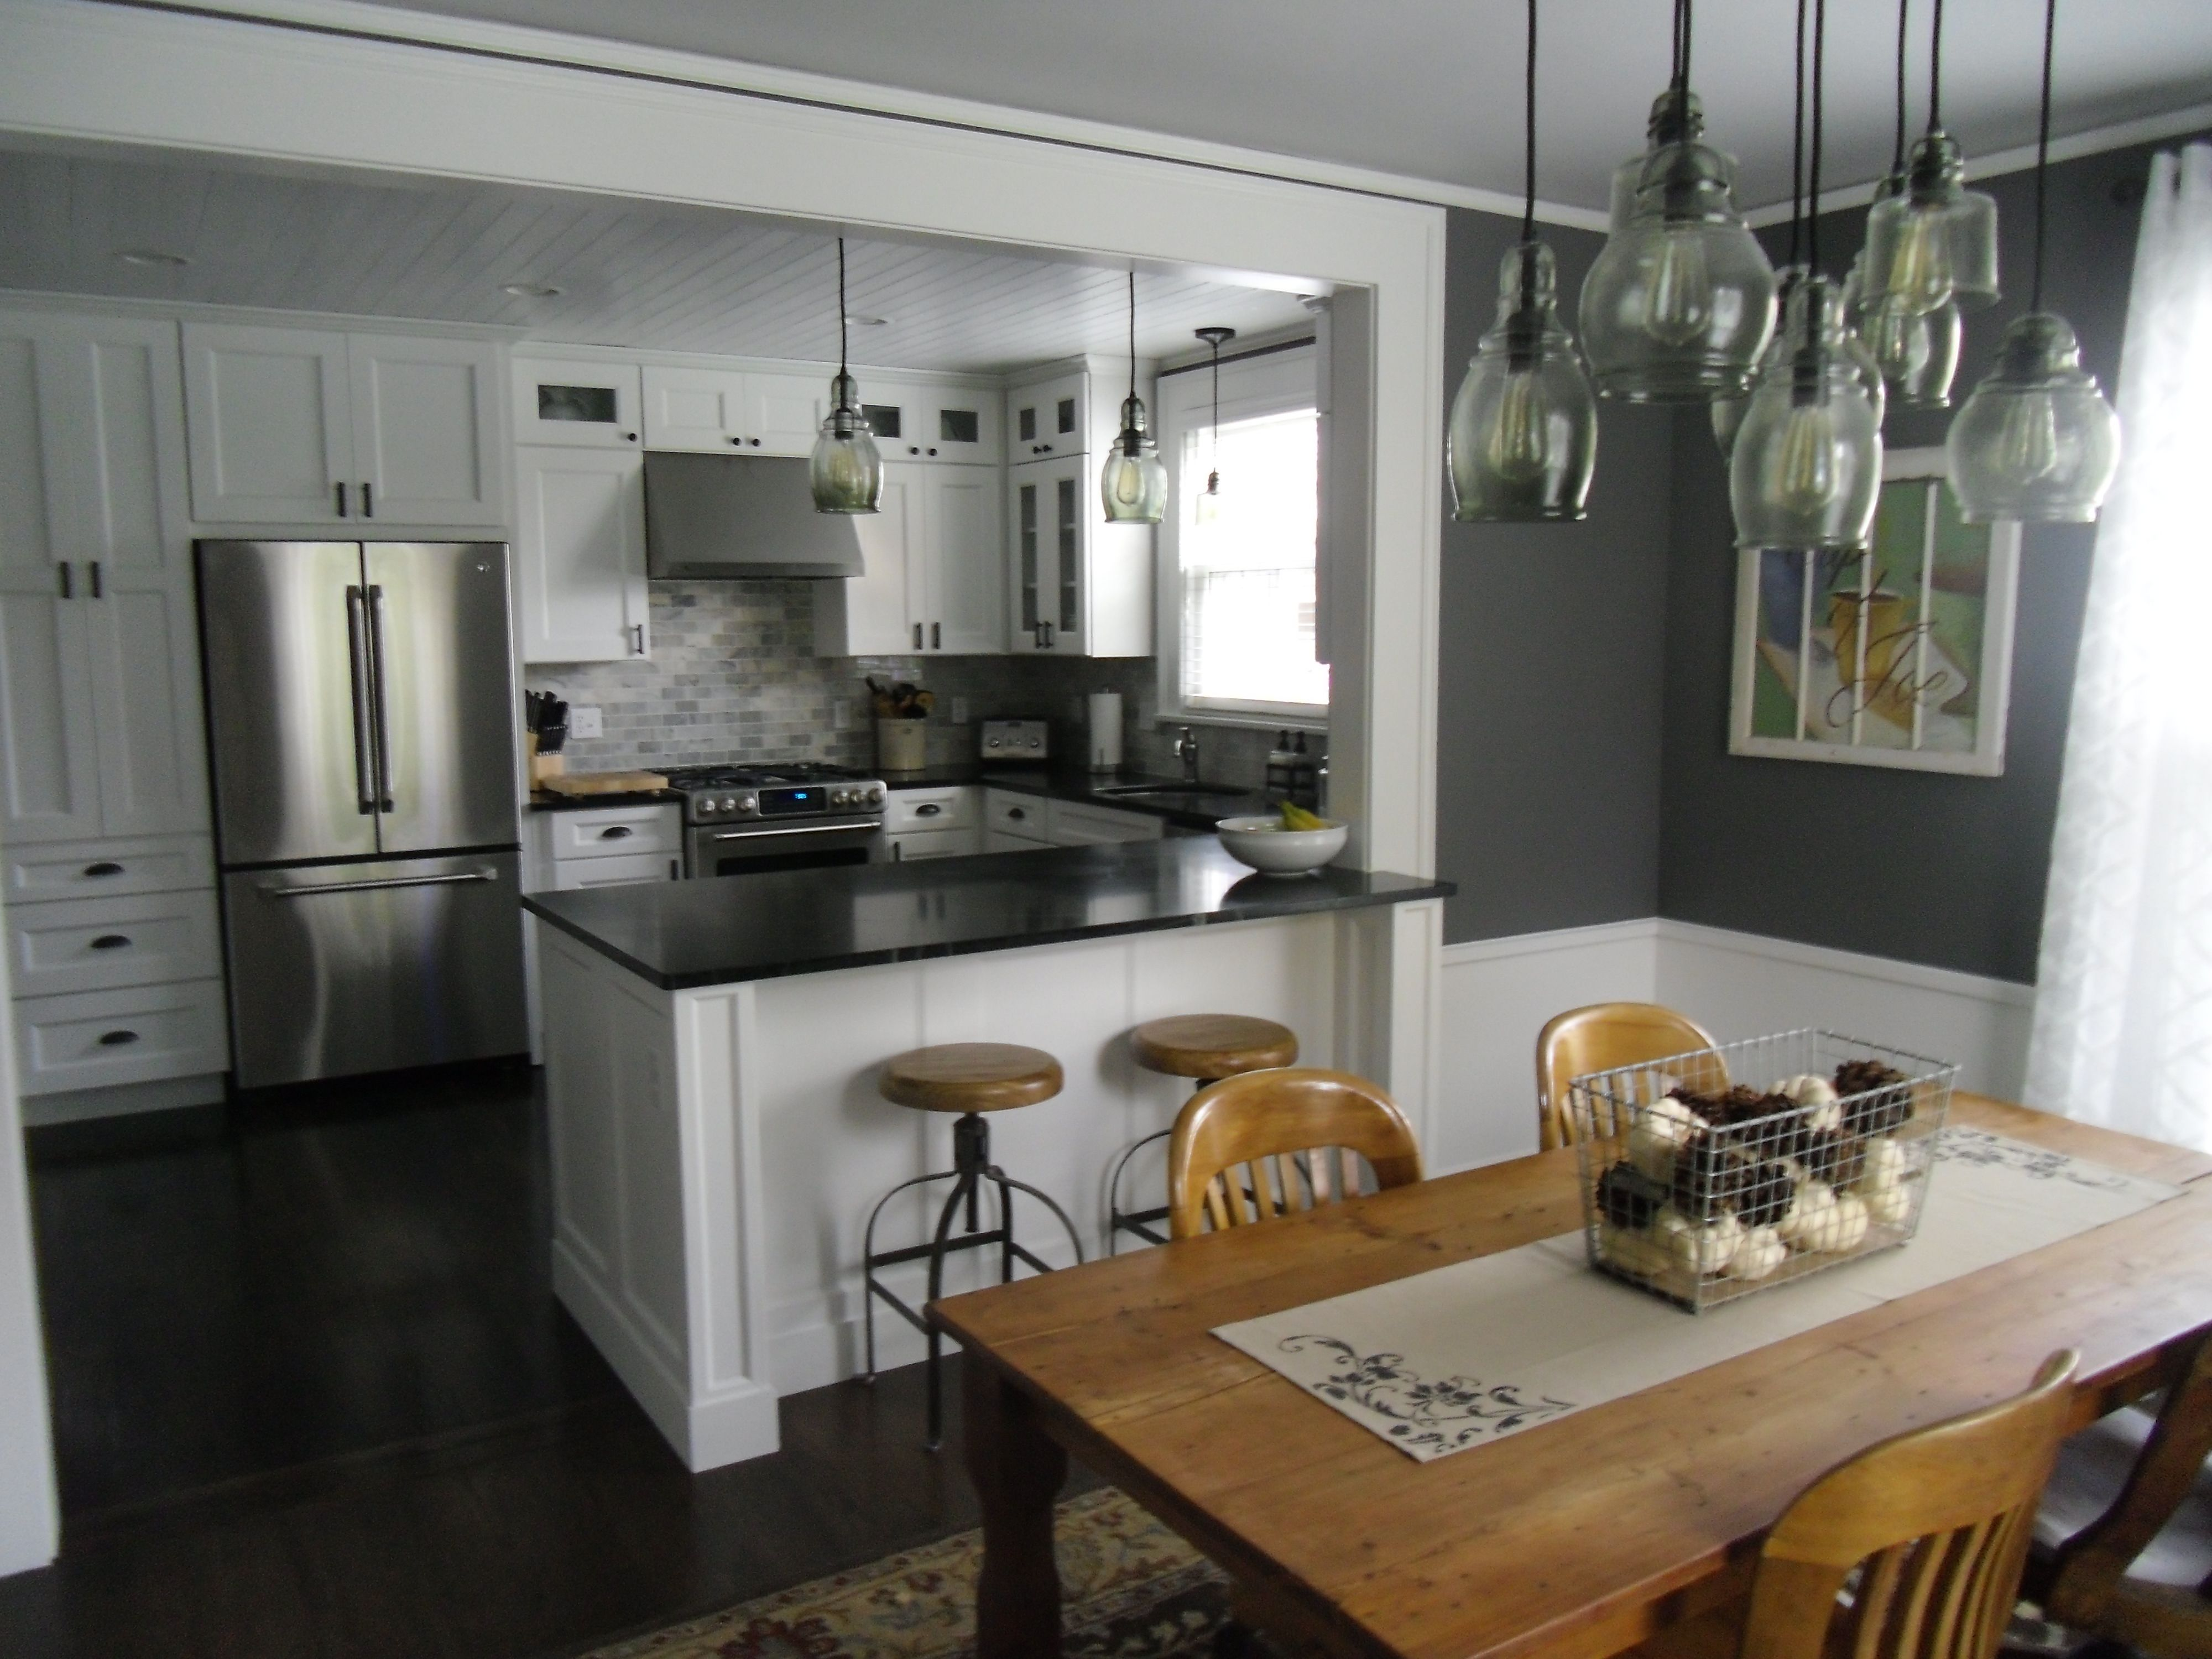 White Kitchen Cabinets Soapstone Counters Pottery Barn Paxton Lights World Market Twist Swivel